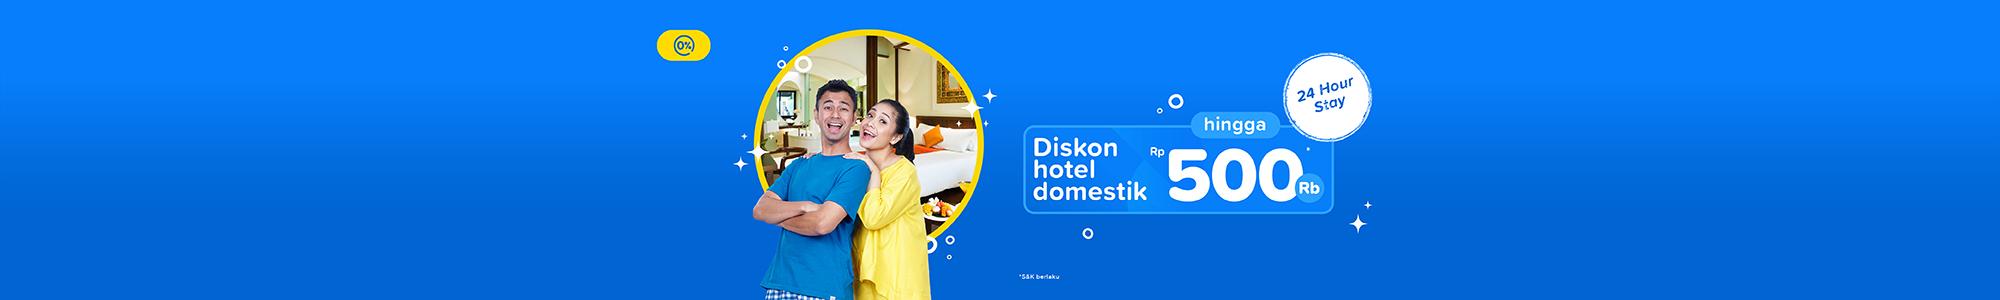 Promo Hotel Online Paling Murah